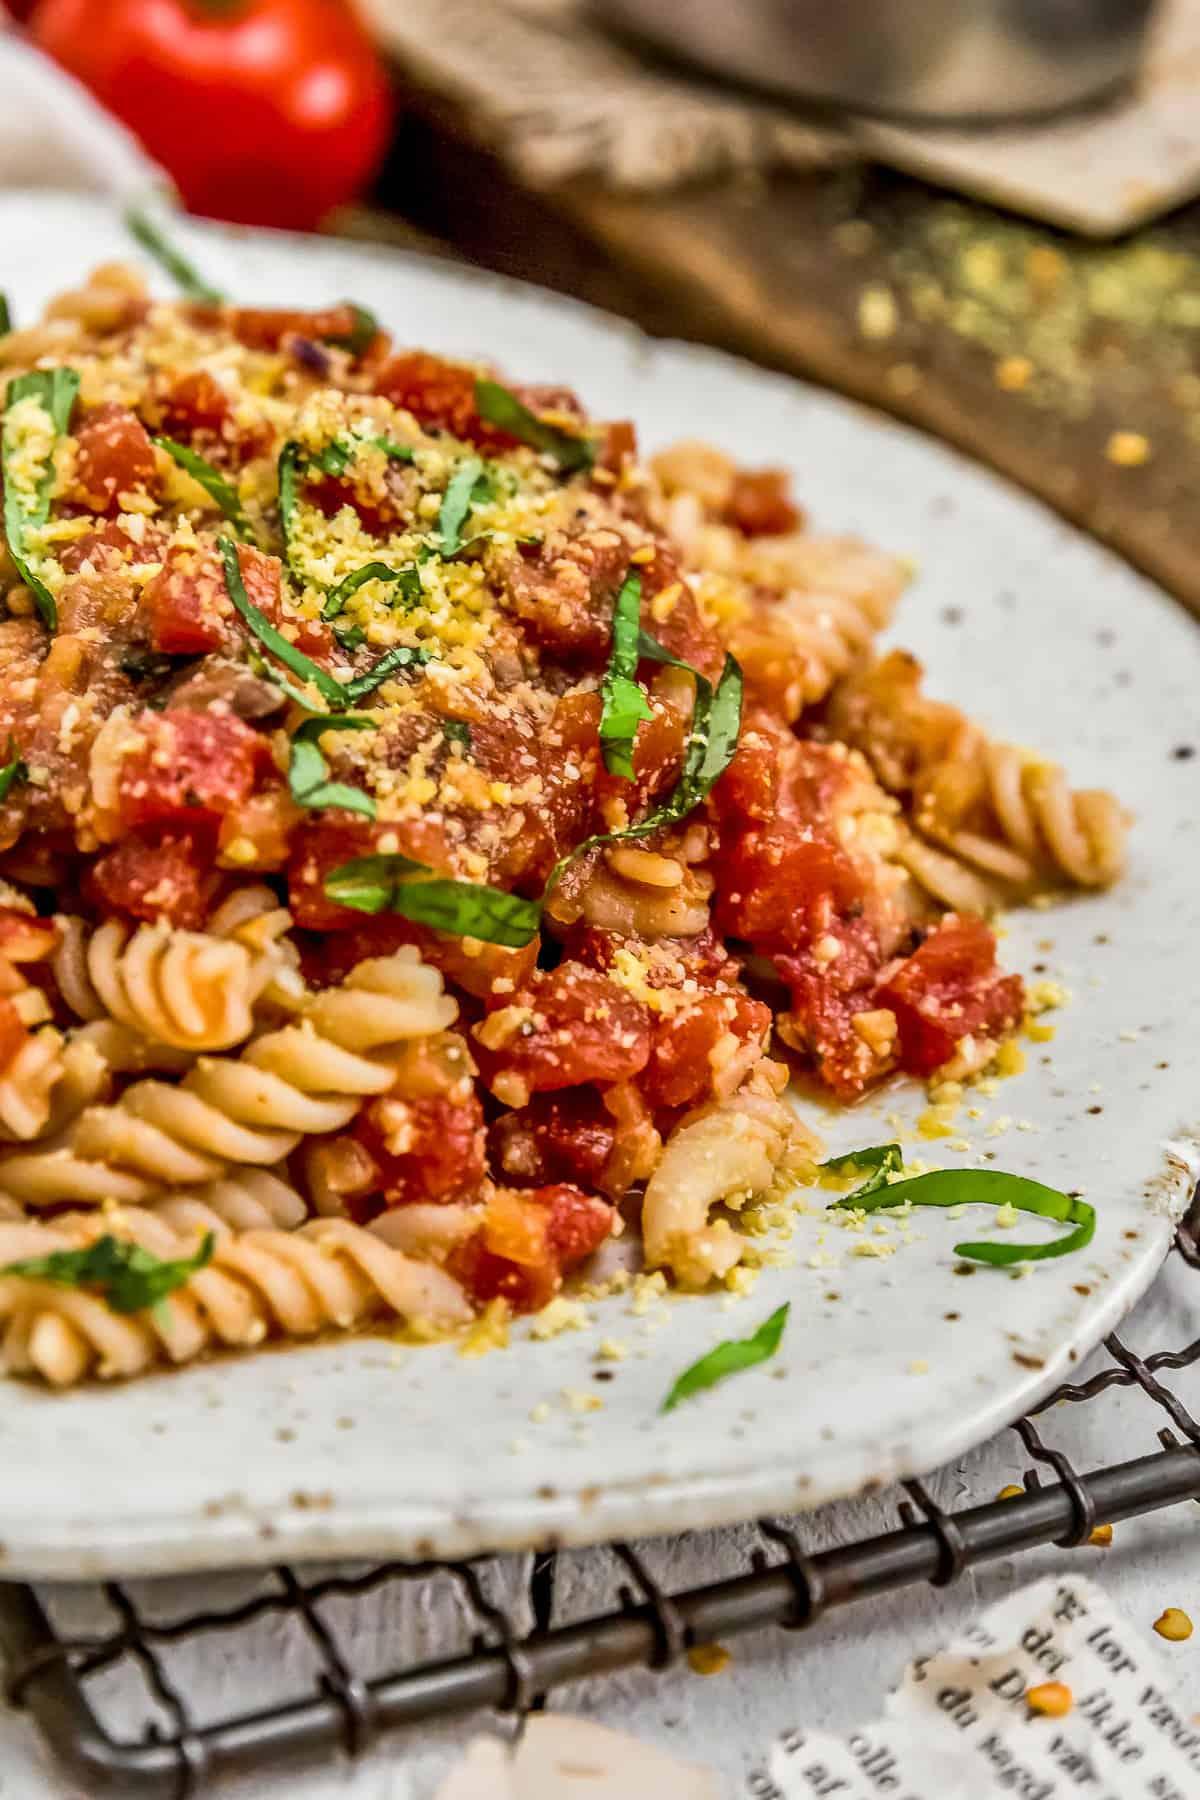 Close up of Spicy Arrabbiata Sauce with pasta